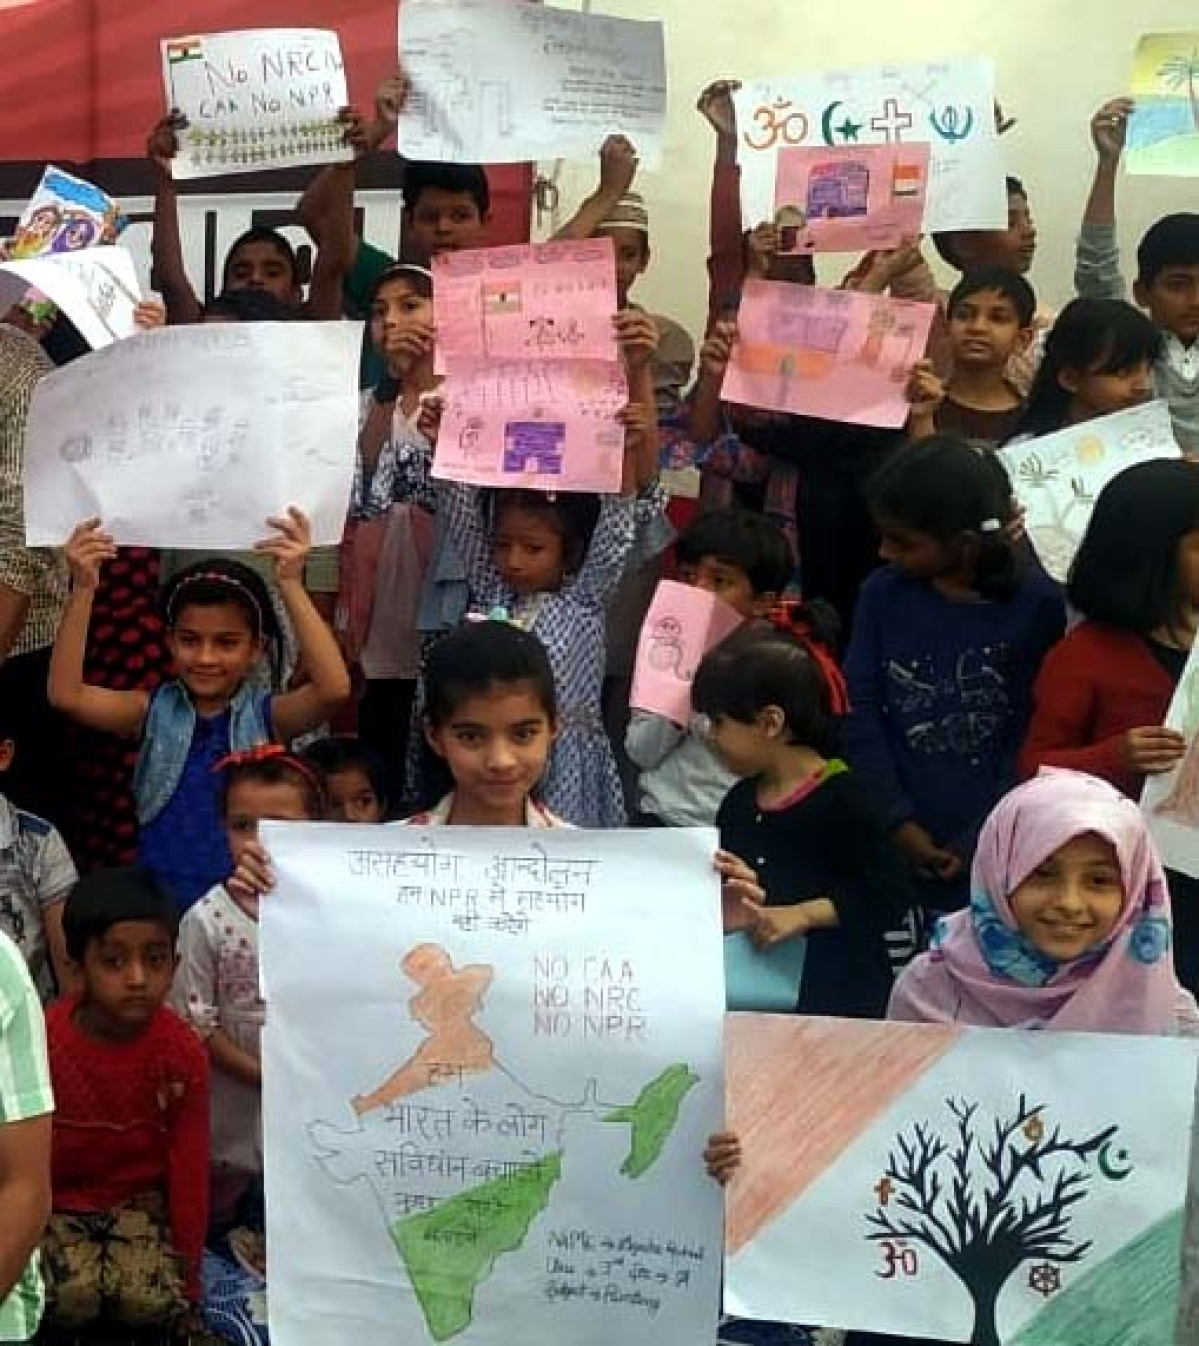 Anti CAA NRC protest in Bhopal: Iqbal Maidan Satyagrah reaches Day 74, Children give message on No-NRC, CAA & coronavirus through colours